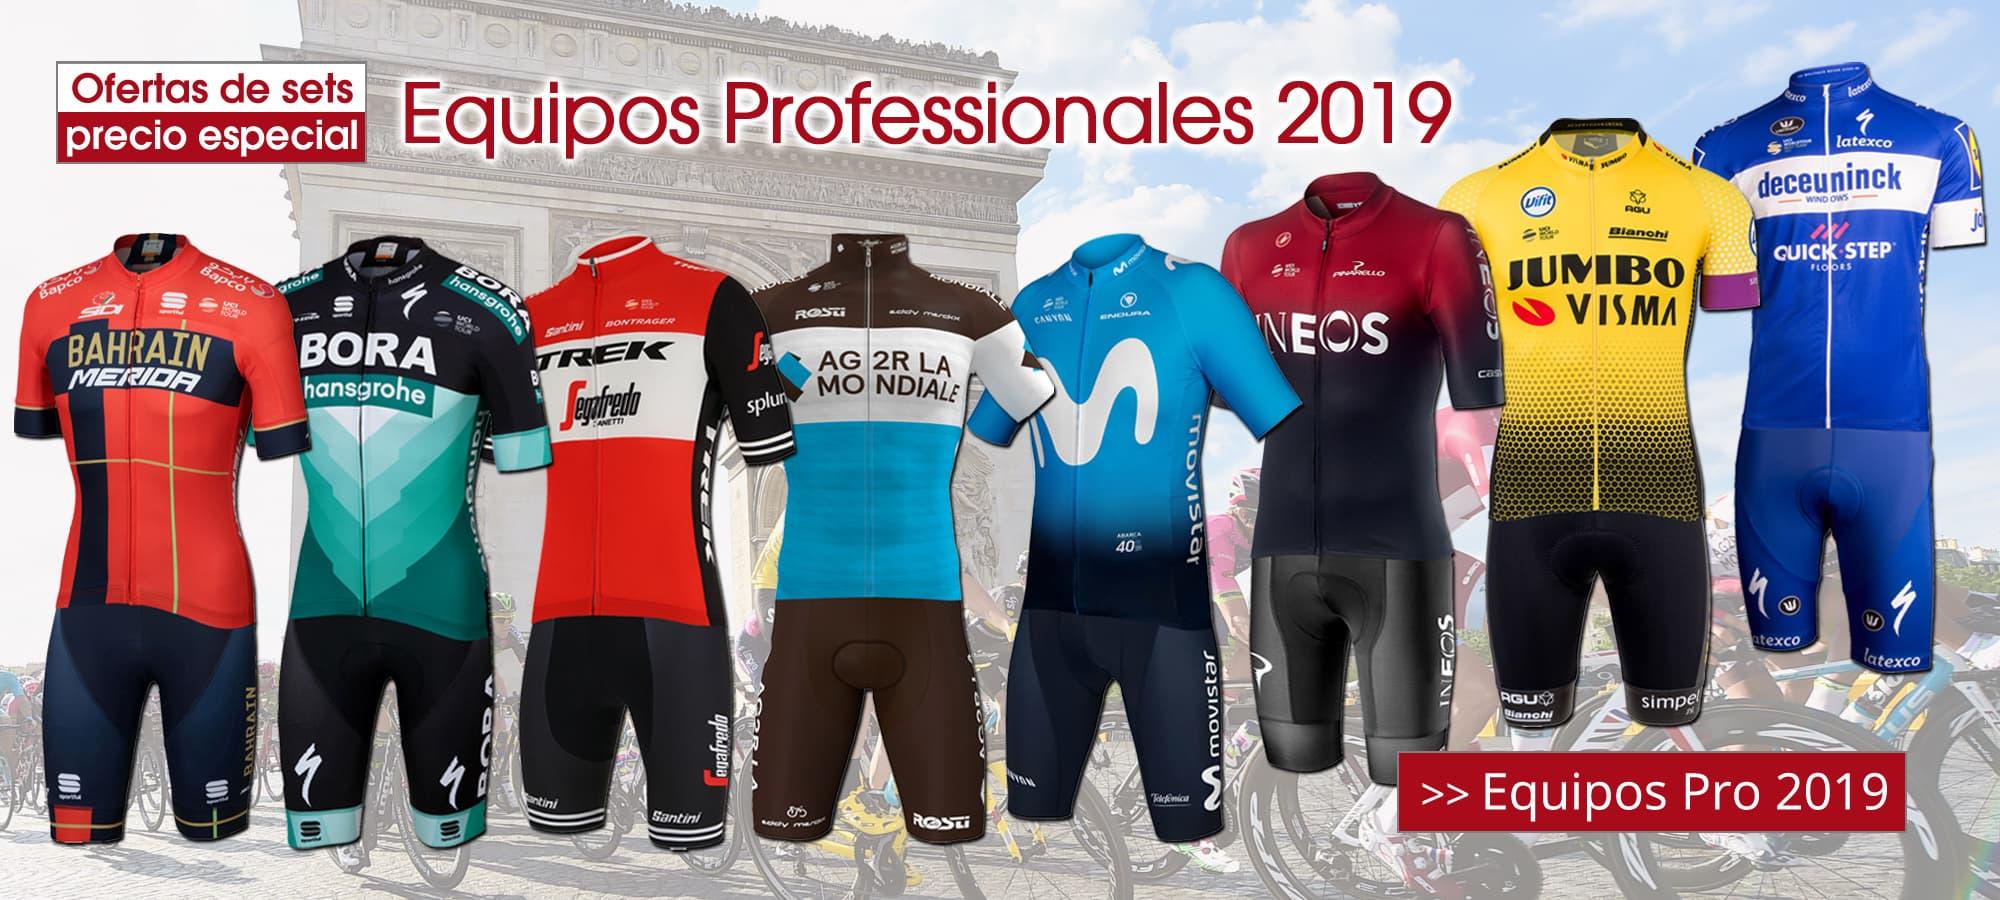 Equipos Pro 2019